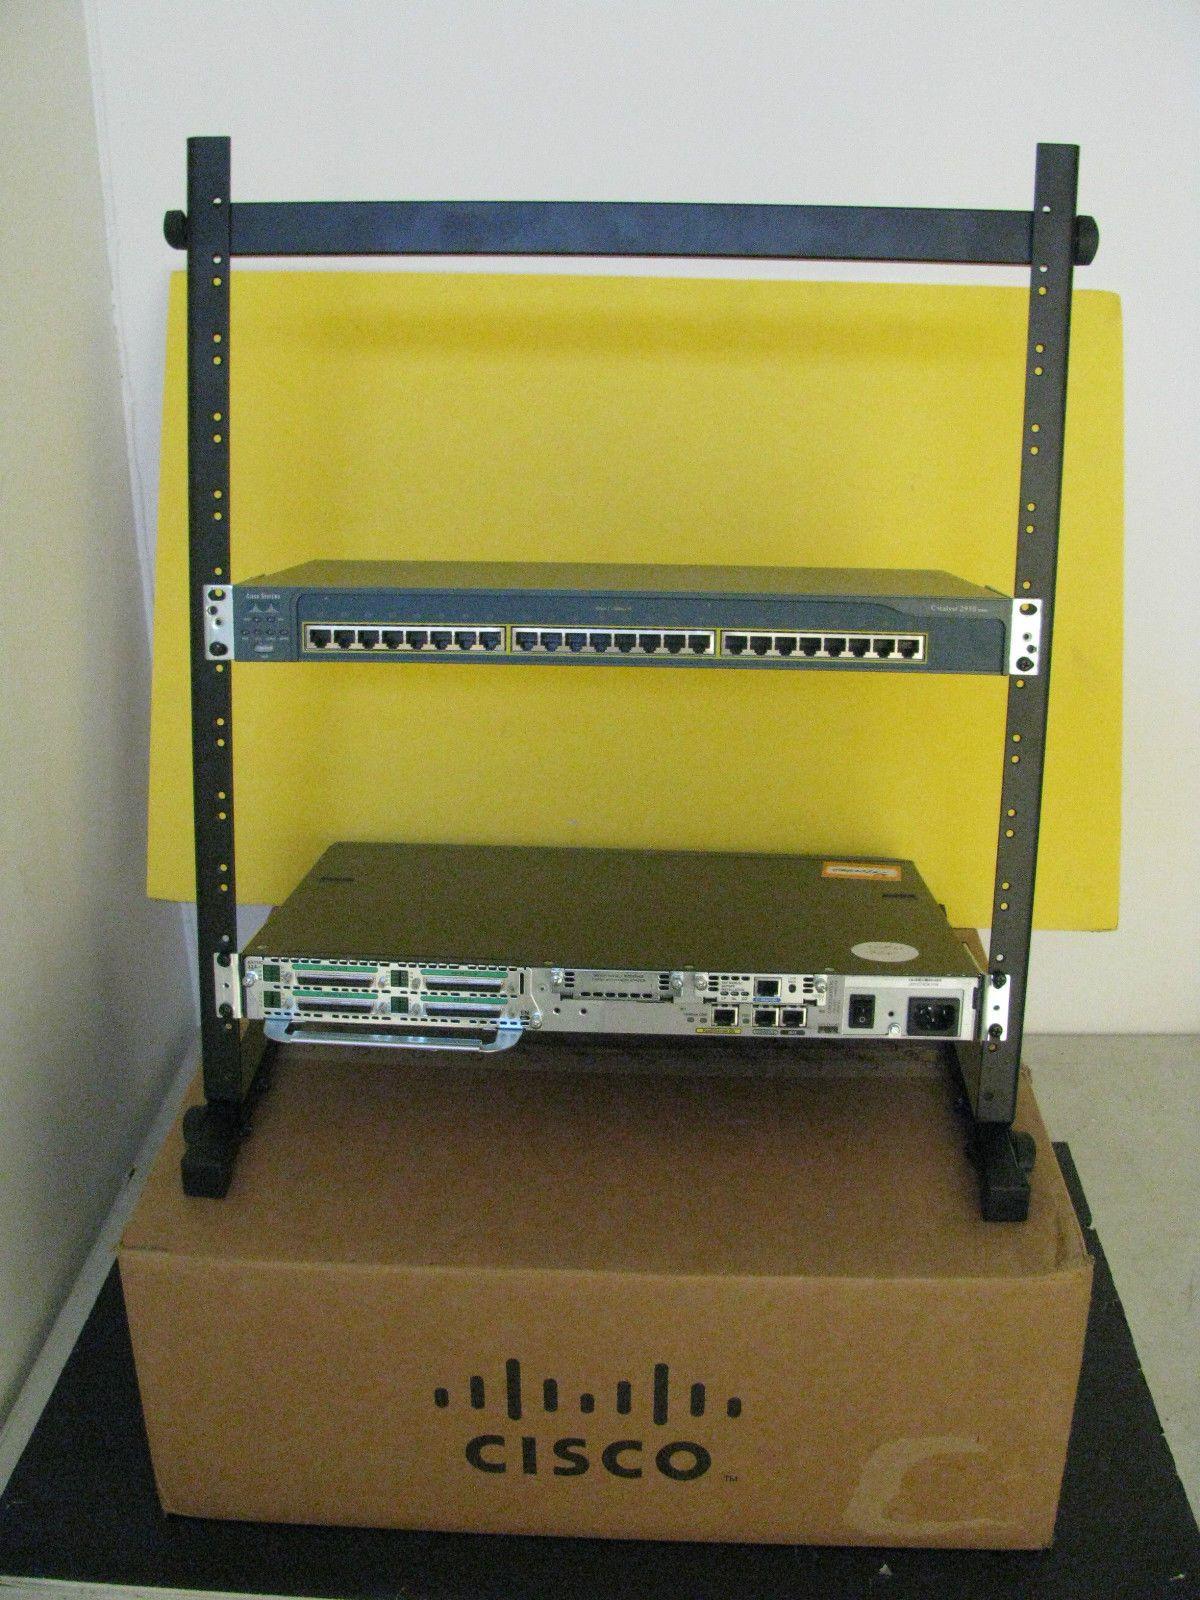 cisco 12u 19 rack ccna ccnp ccie network lab 3524 3550 2500 2600 2800 3560 3750 ebay this is a top pick  [ 1200 x 1600 Pixel ]